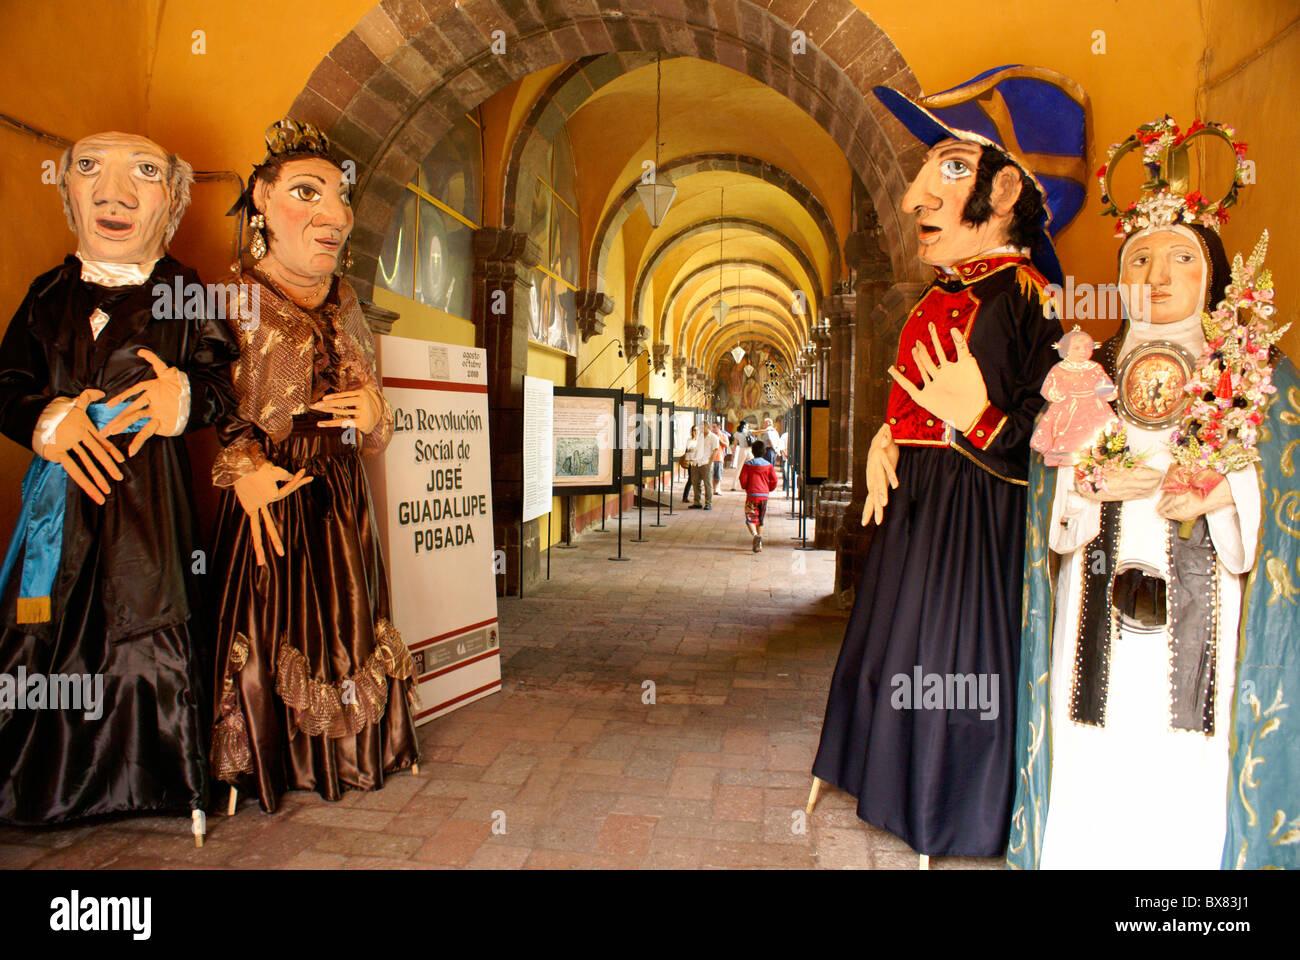 Mojigangas,giant papier mache puppets in the Bellas Artes, San Miguel de Allende, Mexico. - Stock Image